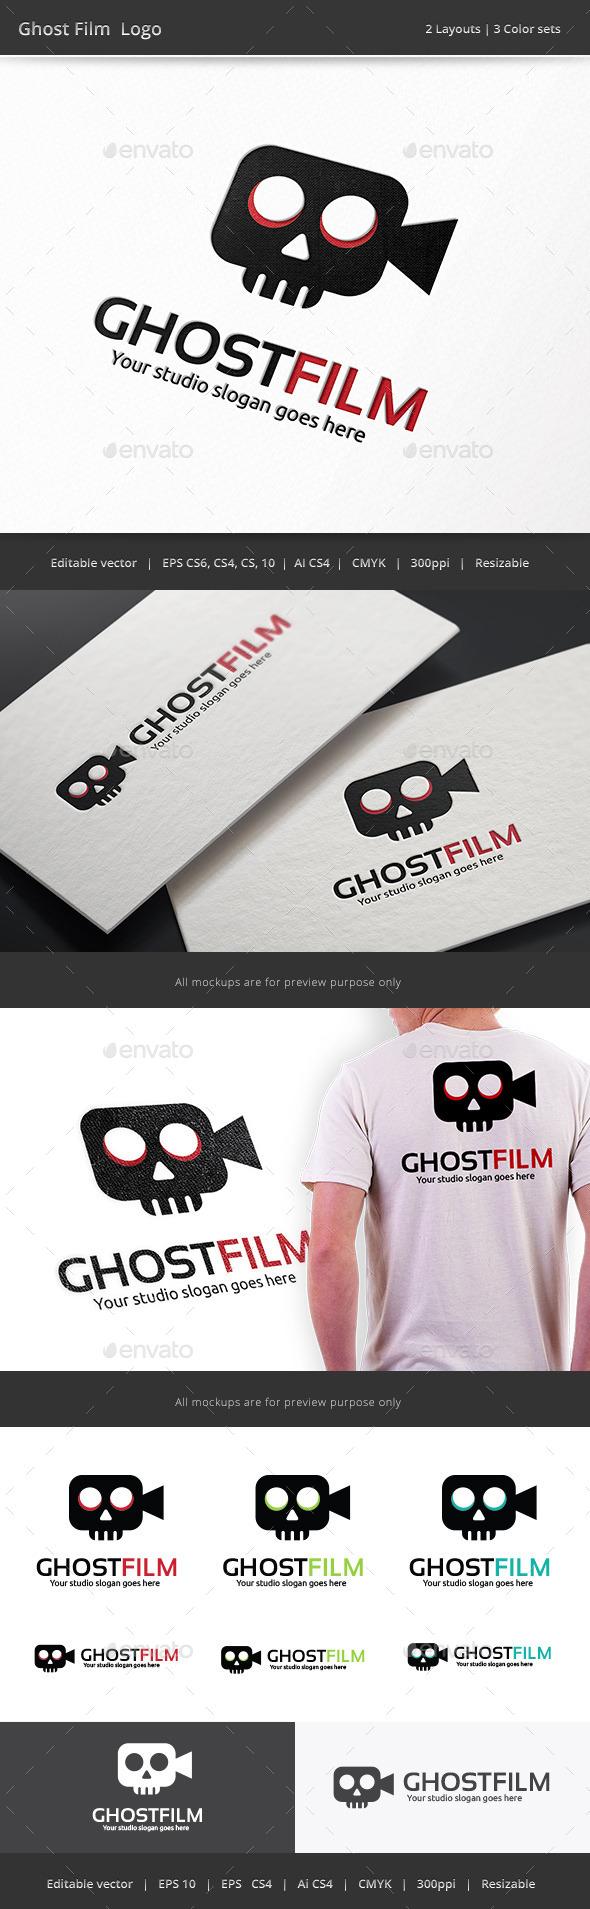 Ghost Film Logo